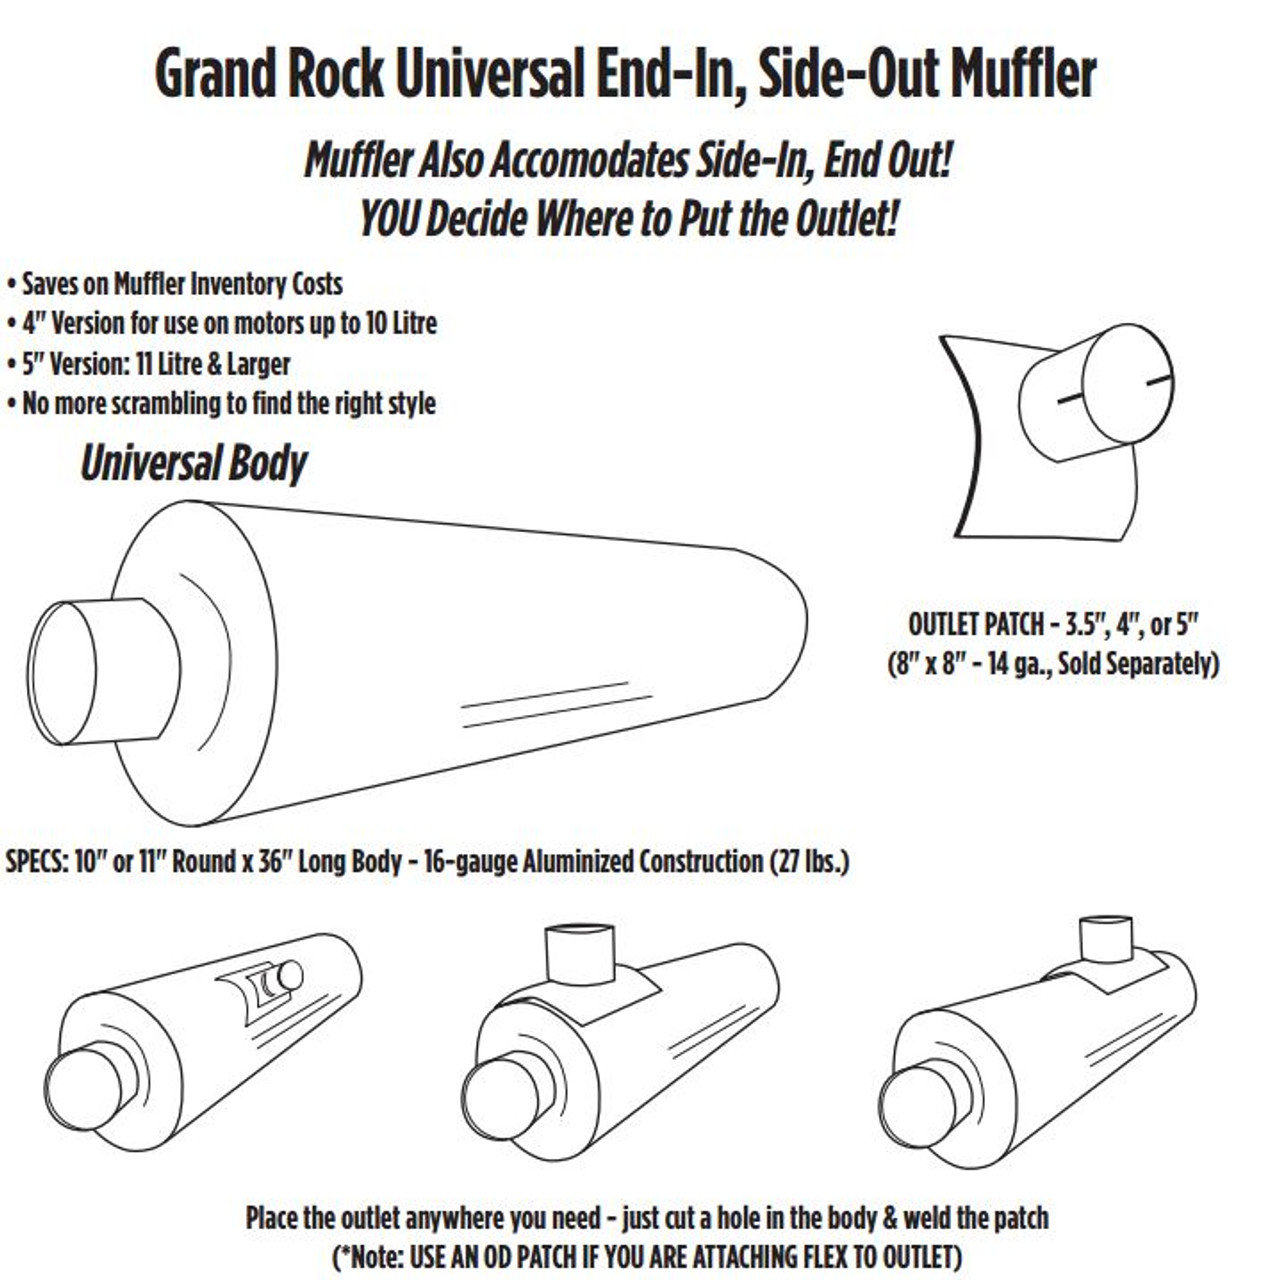 "ARG-0436OD 10"" x 36"" Universal Muffler with 4"" OD on 1 End"